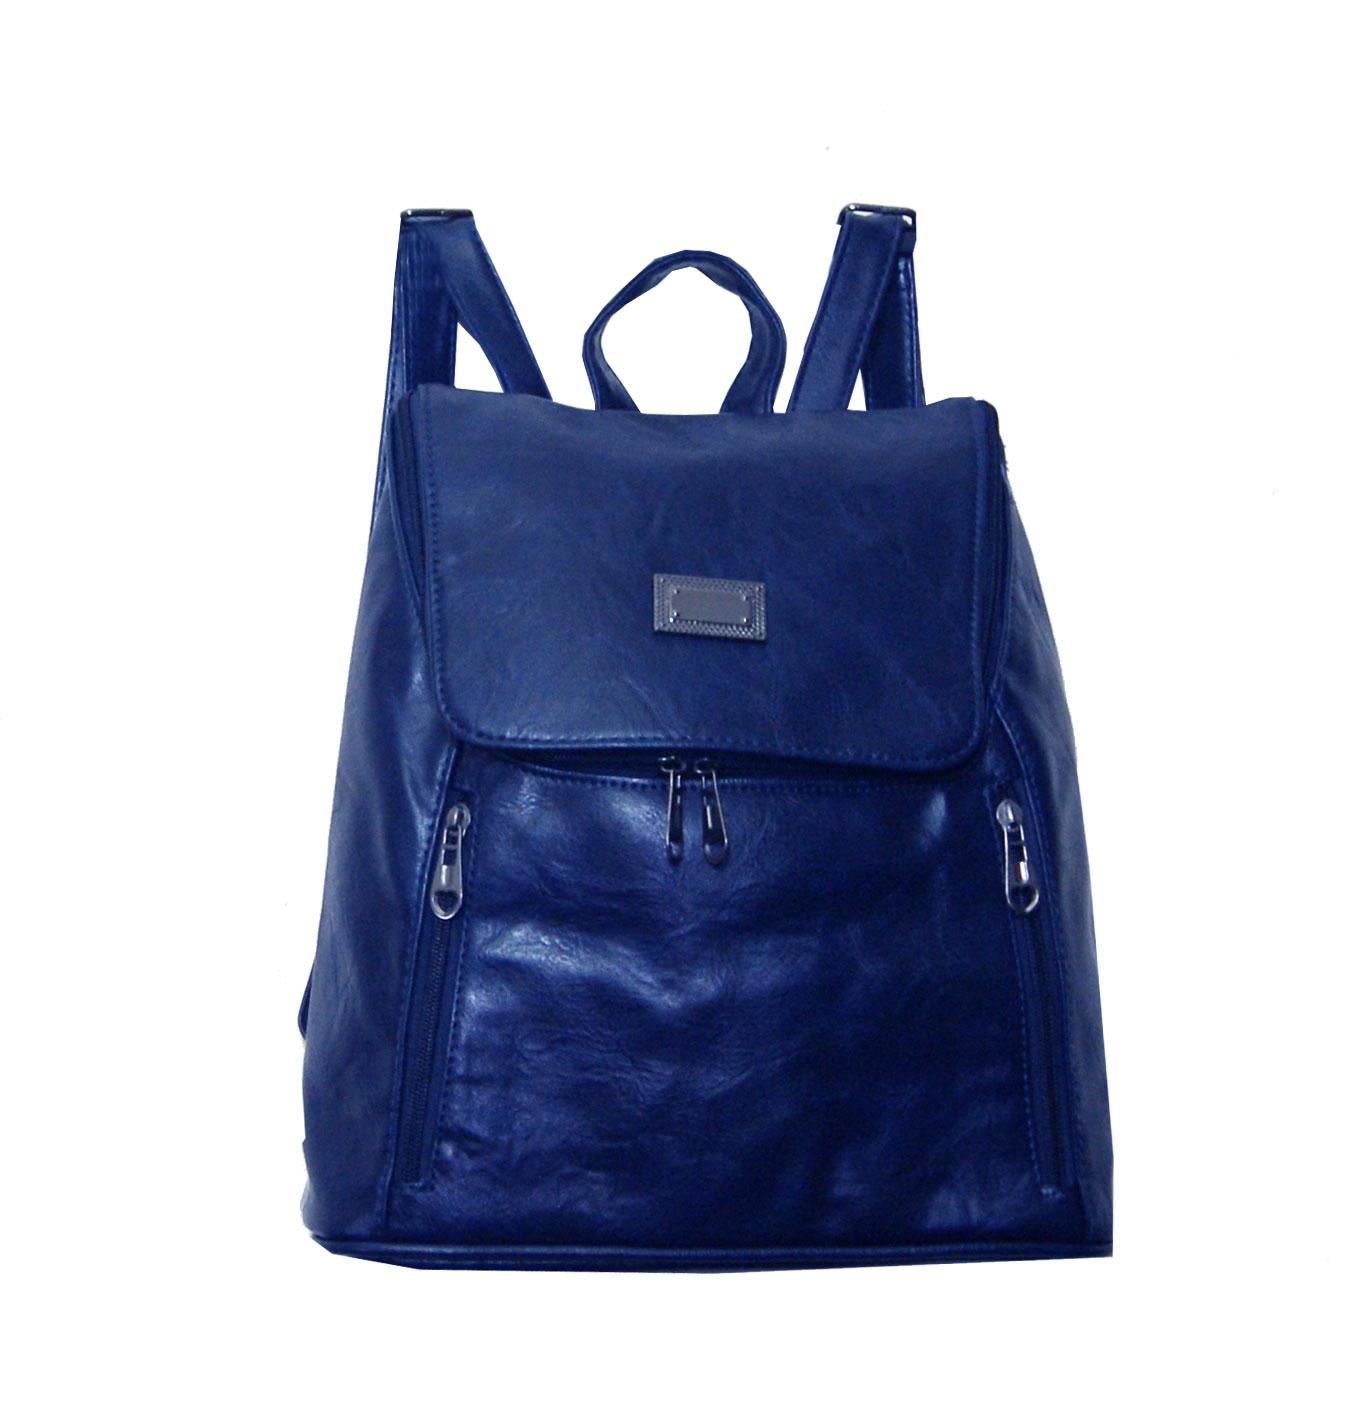 Backpack No 751 - Μπλε (Silvio)